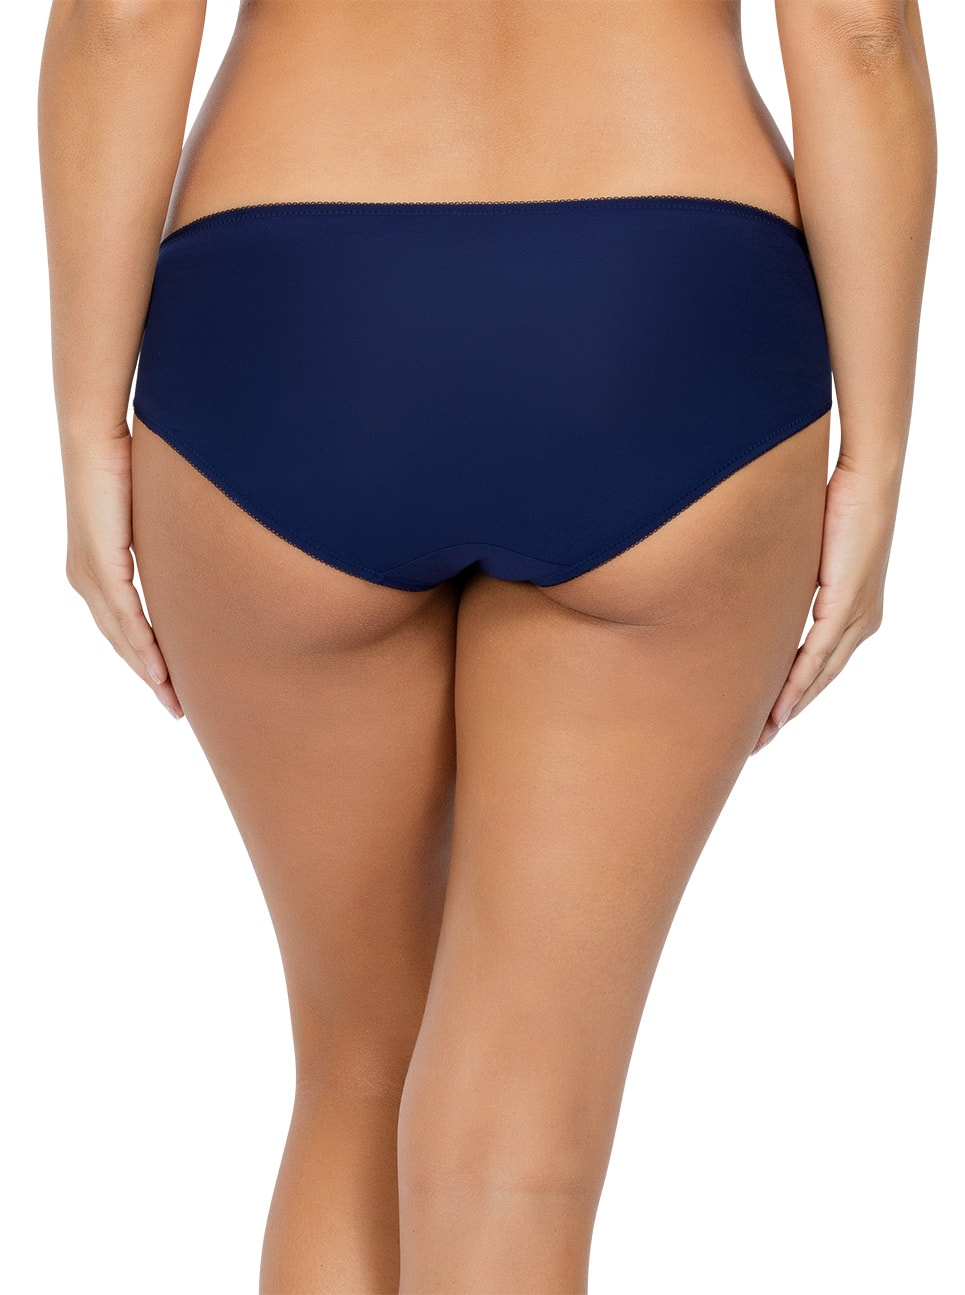 PARFAIT Cora BikiniP5633 NavyBlue Back - Cora Bikini - Navy Blue - P5633